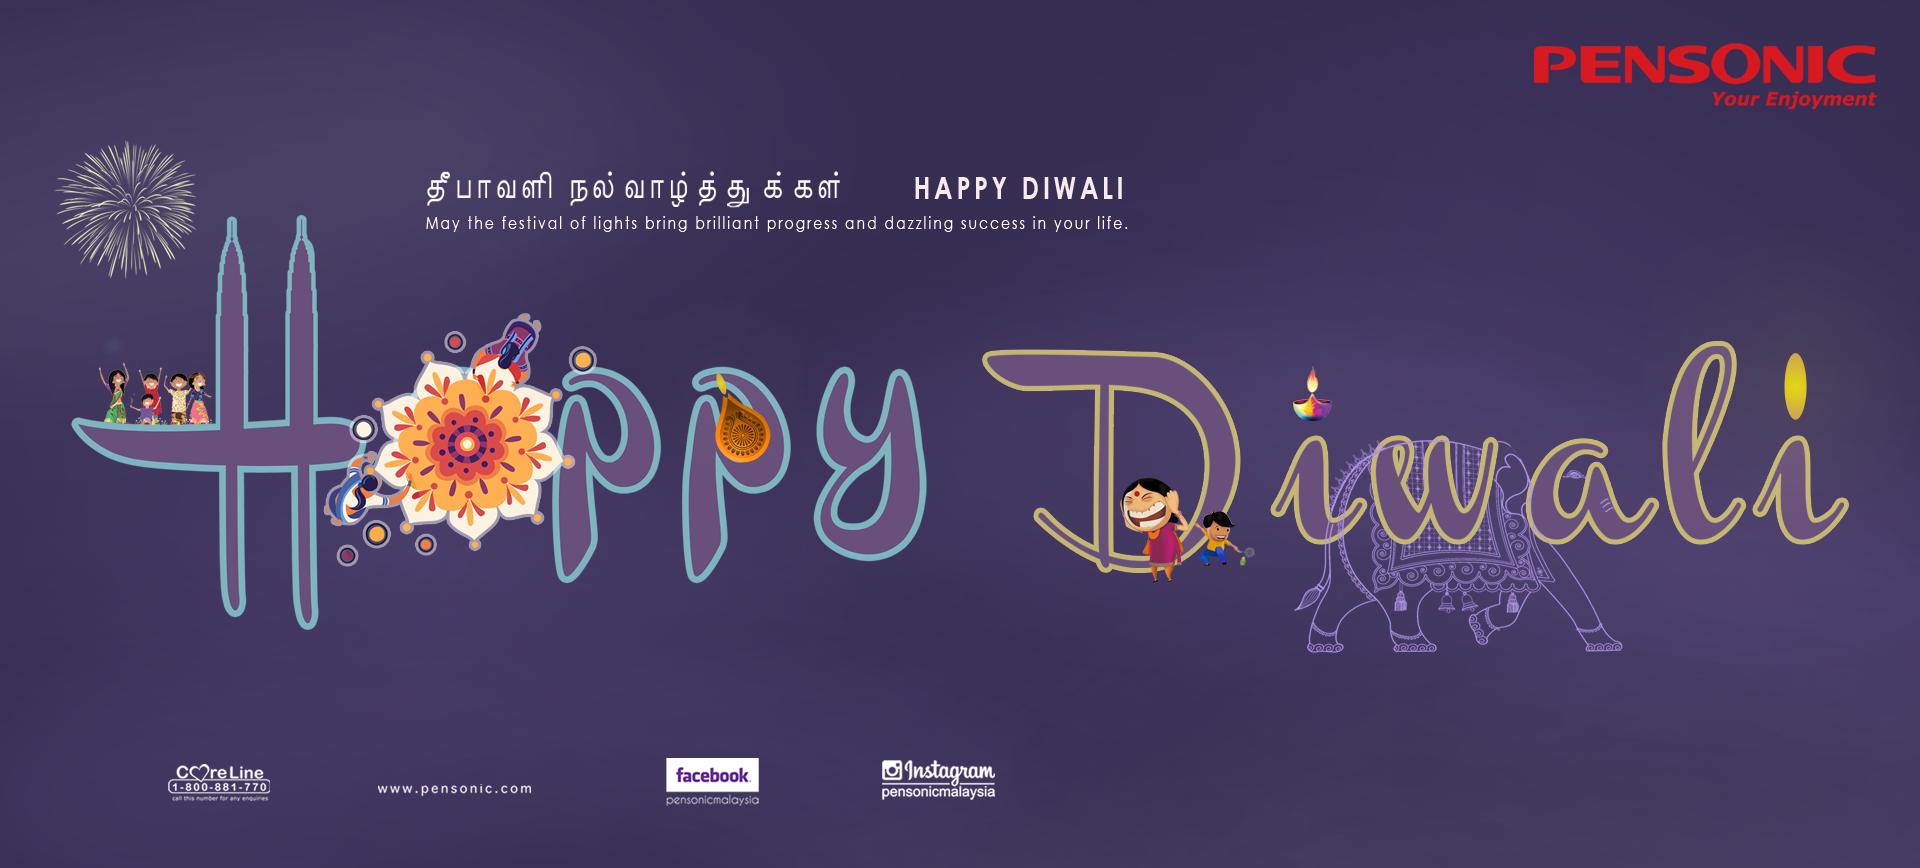 pensonic_diwali_banner